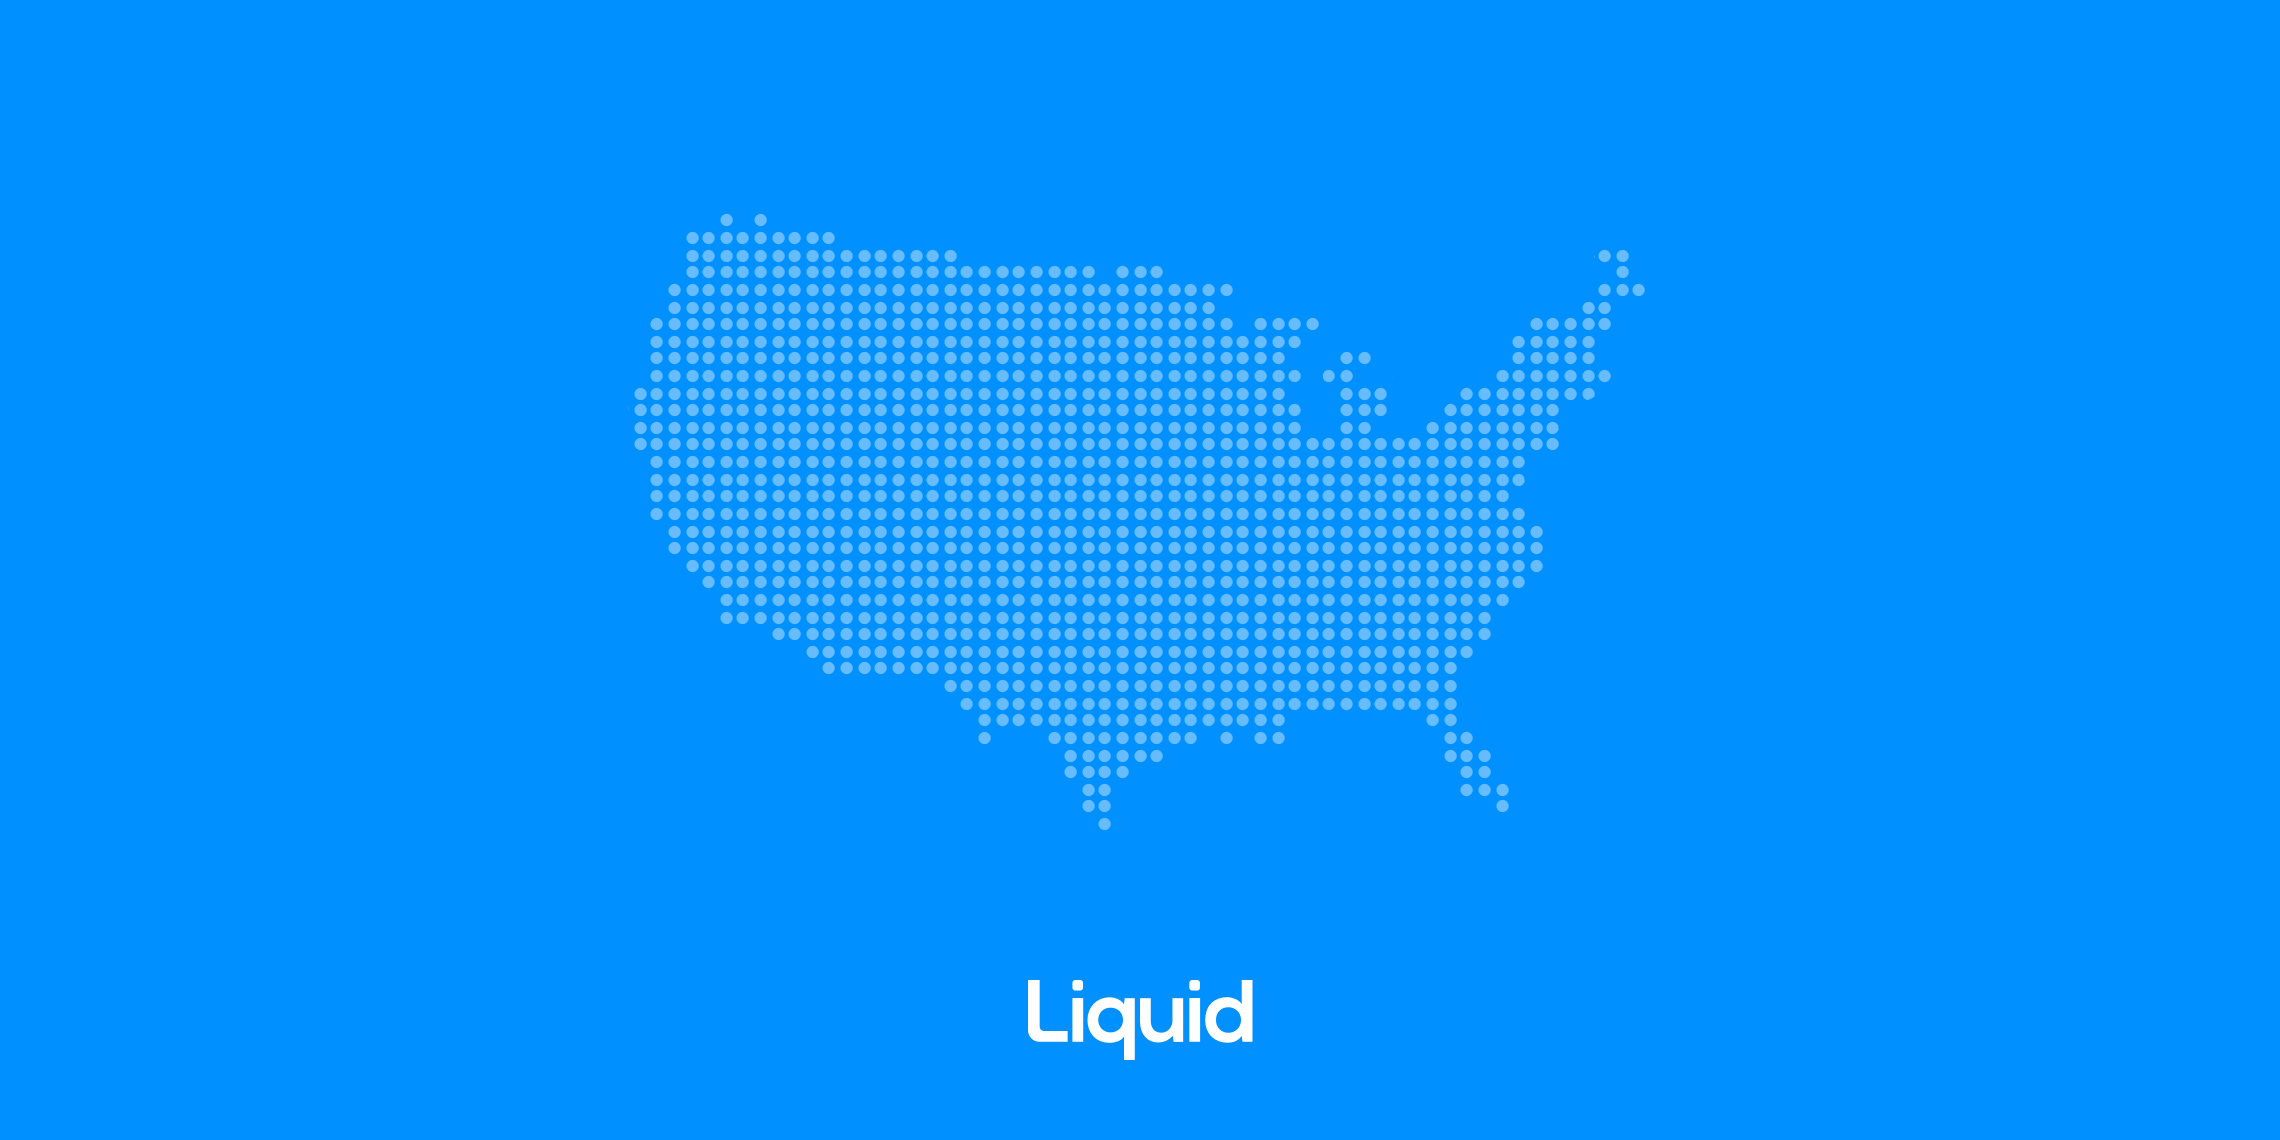 liquid-banner-seo.b69ca702 (1)